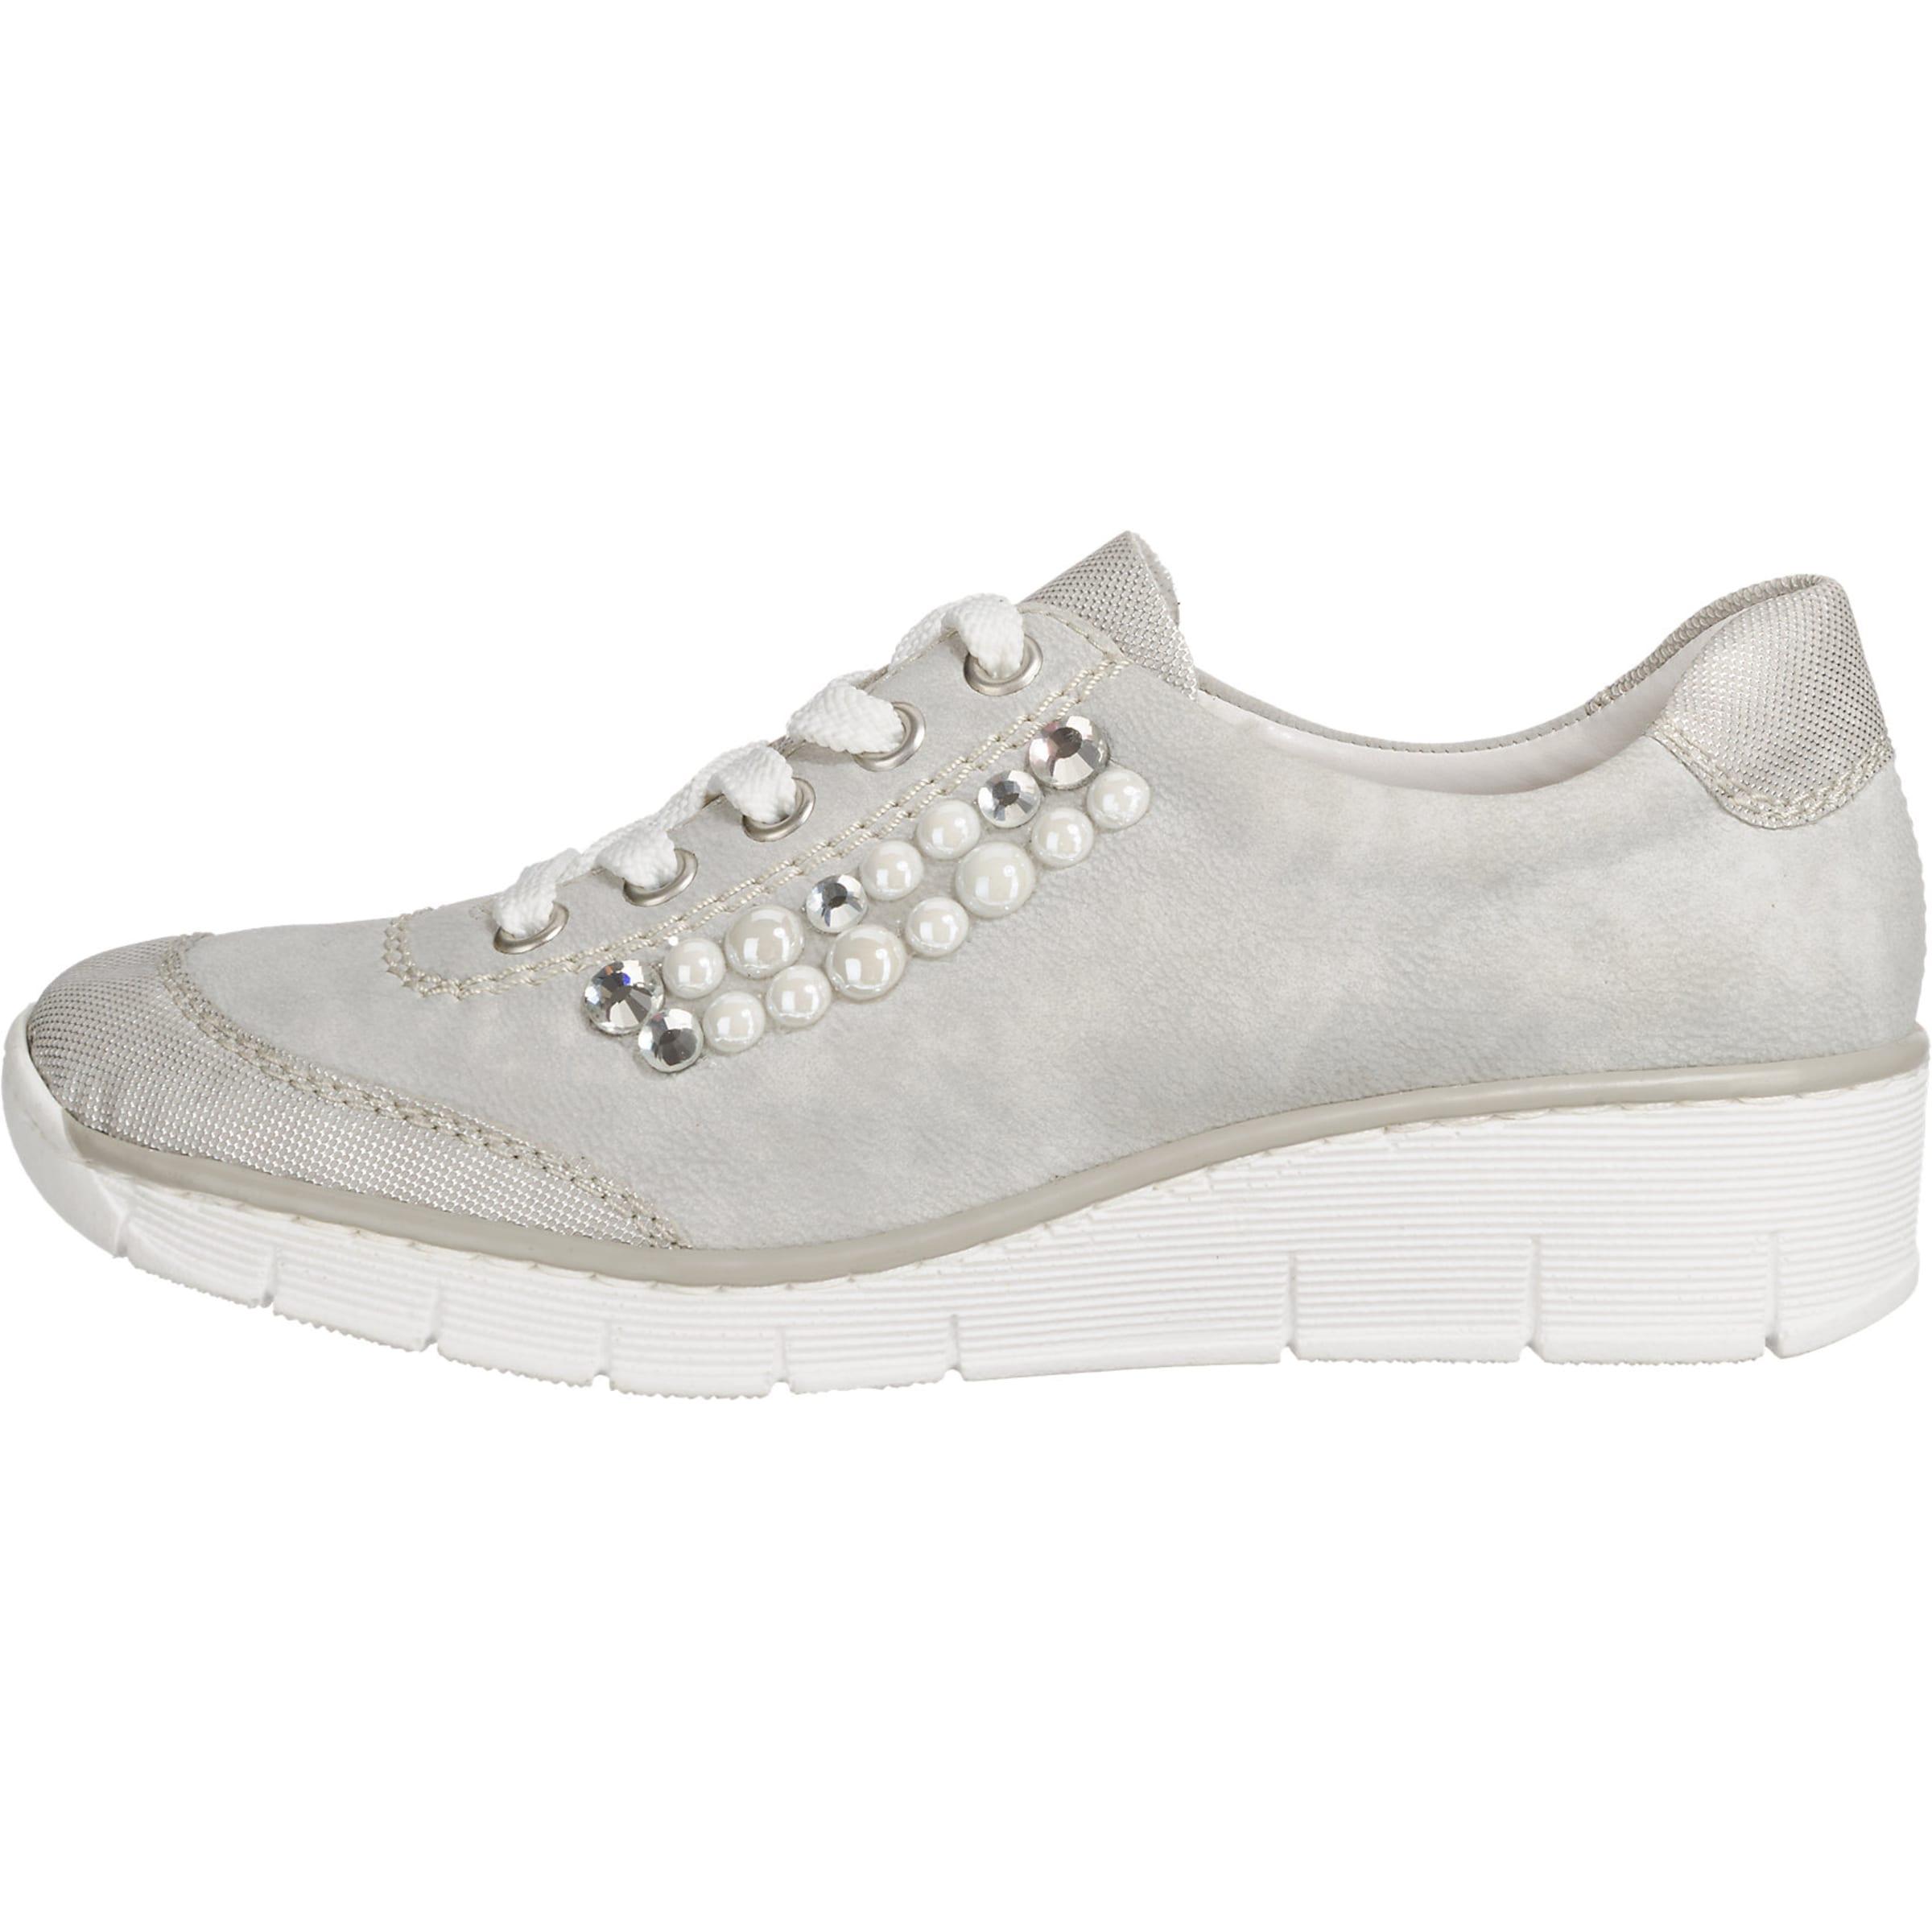 RIEKER Sneakers Günstig Kaufen Billig 6AKks9